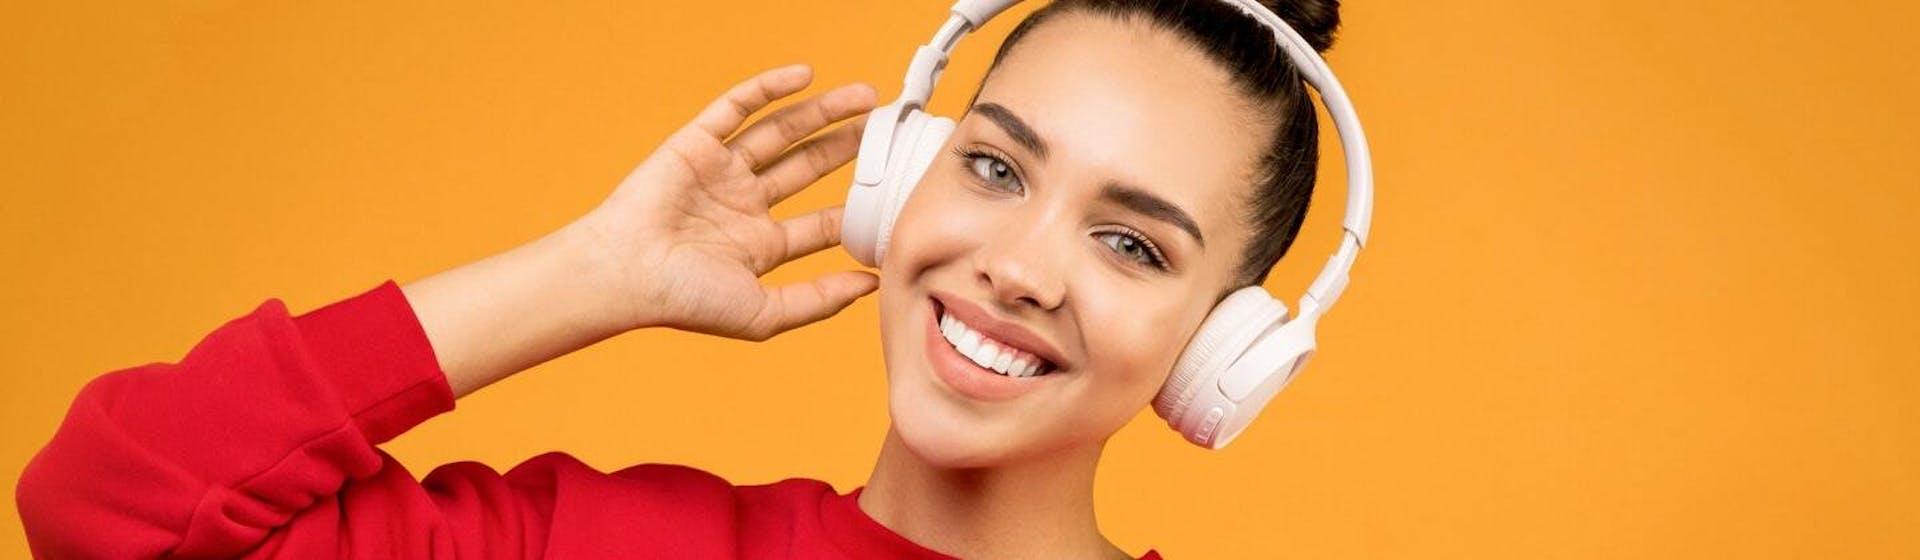 10 podcast en inglés que todo estudiante de idiomas debe escuchar